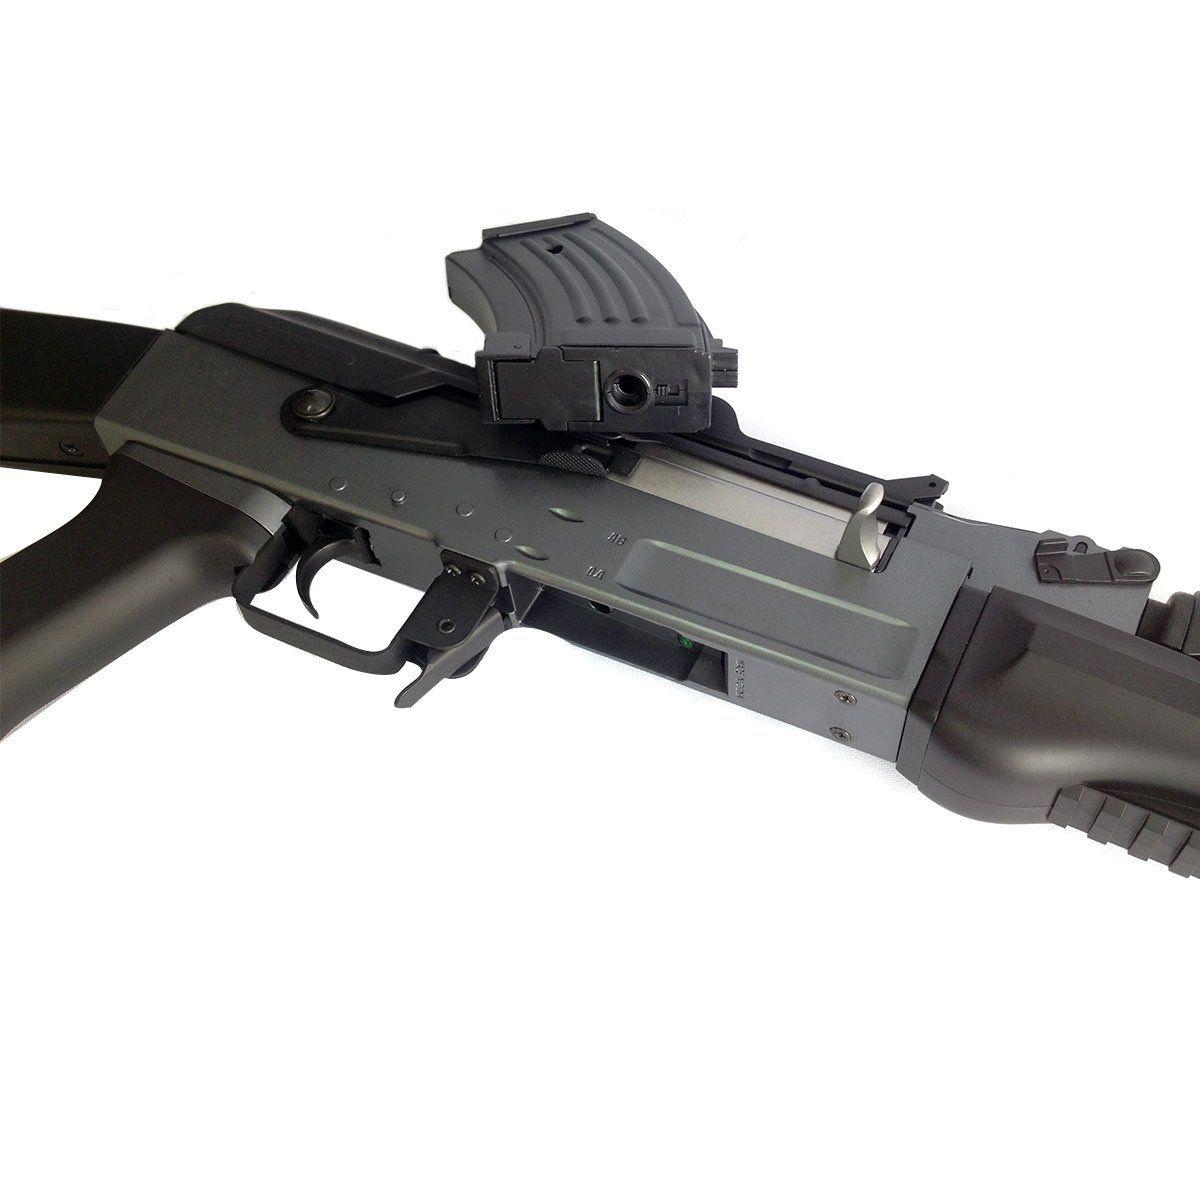 Rifle de Airsoft Cyma AK Spetsnaz CM.037 Elétrico Bivolt 6mm